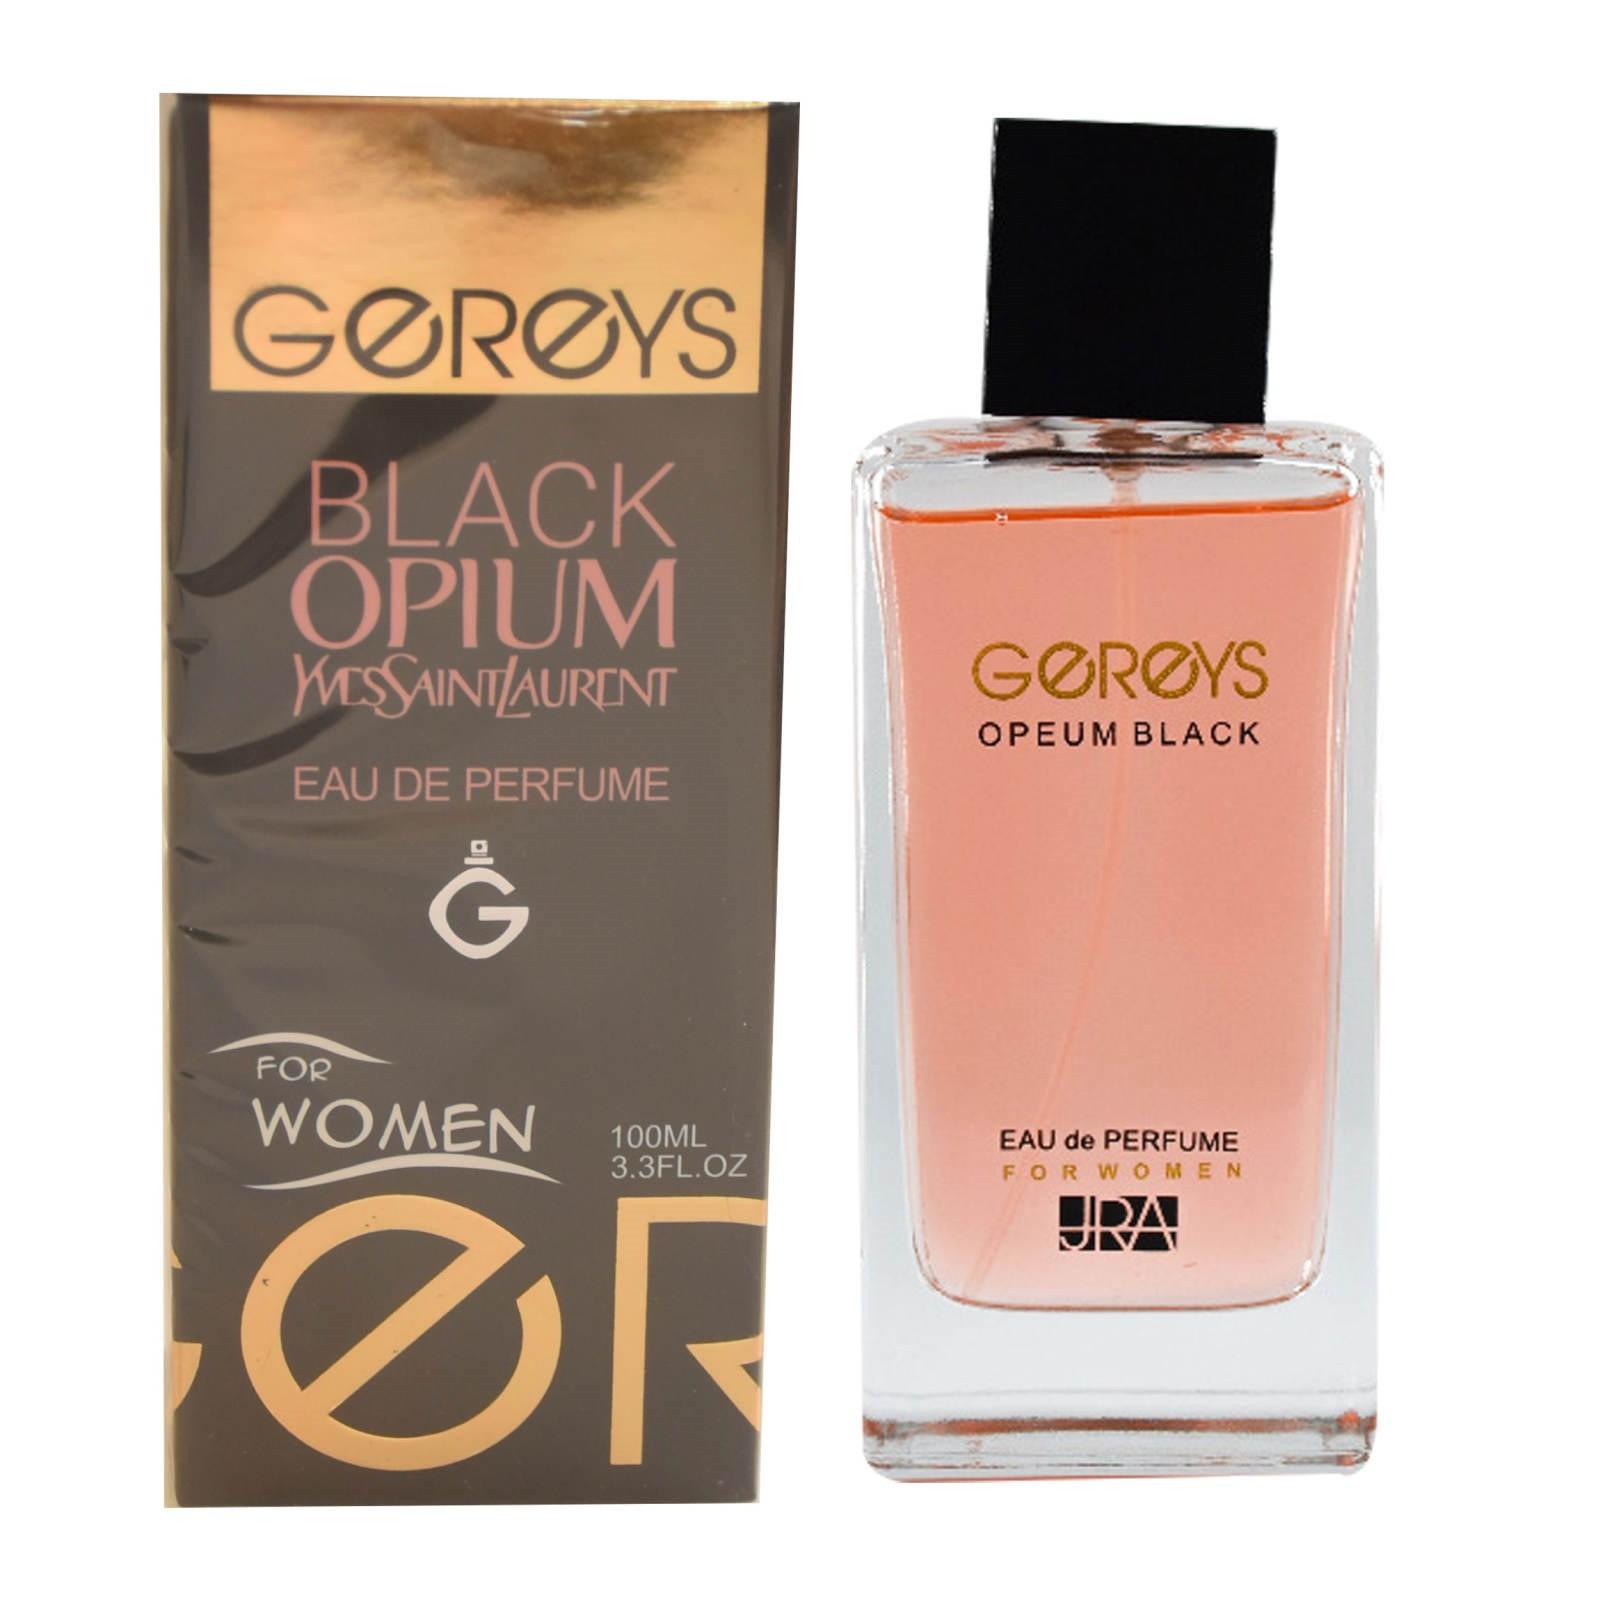 ادو پرفیوم زنانه گریس مدل Black Opium حجم 100 میلی لیتر